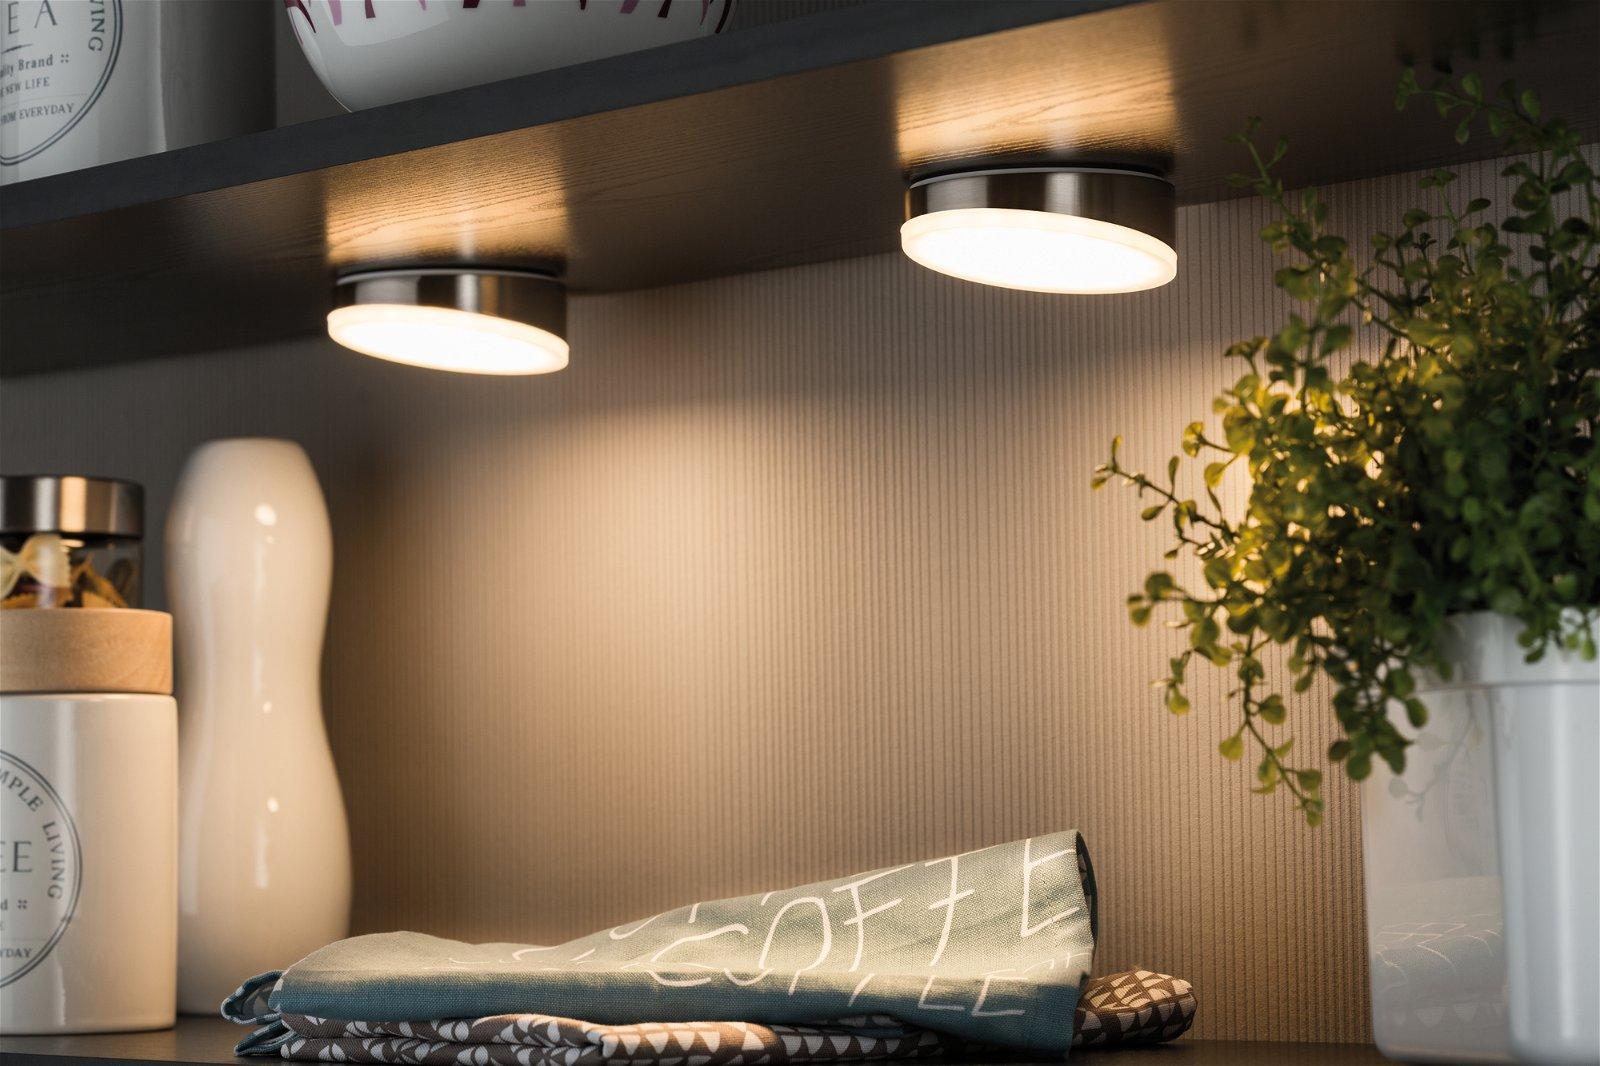 Möbel Aufbauleuchte LED Gate rund 1er-Set inklusive LED-Modul 1x6,2W